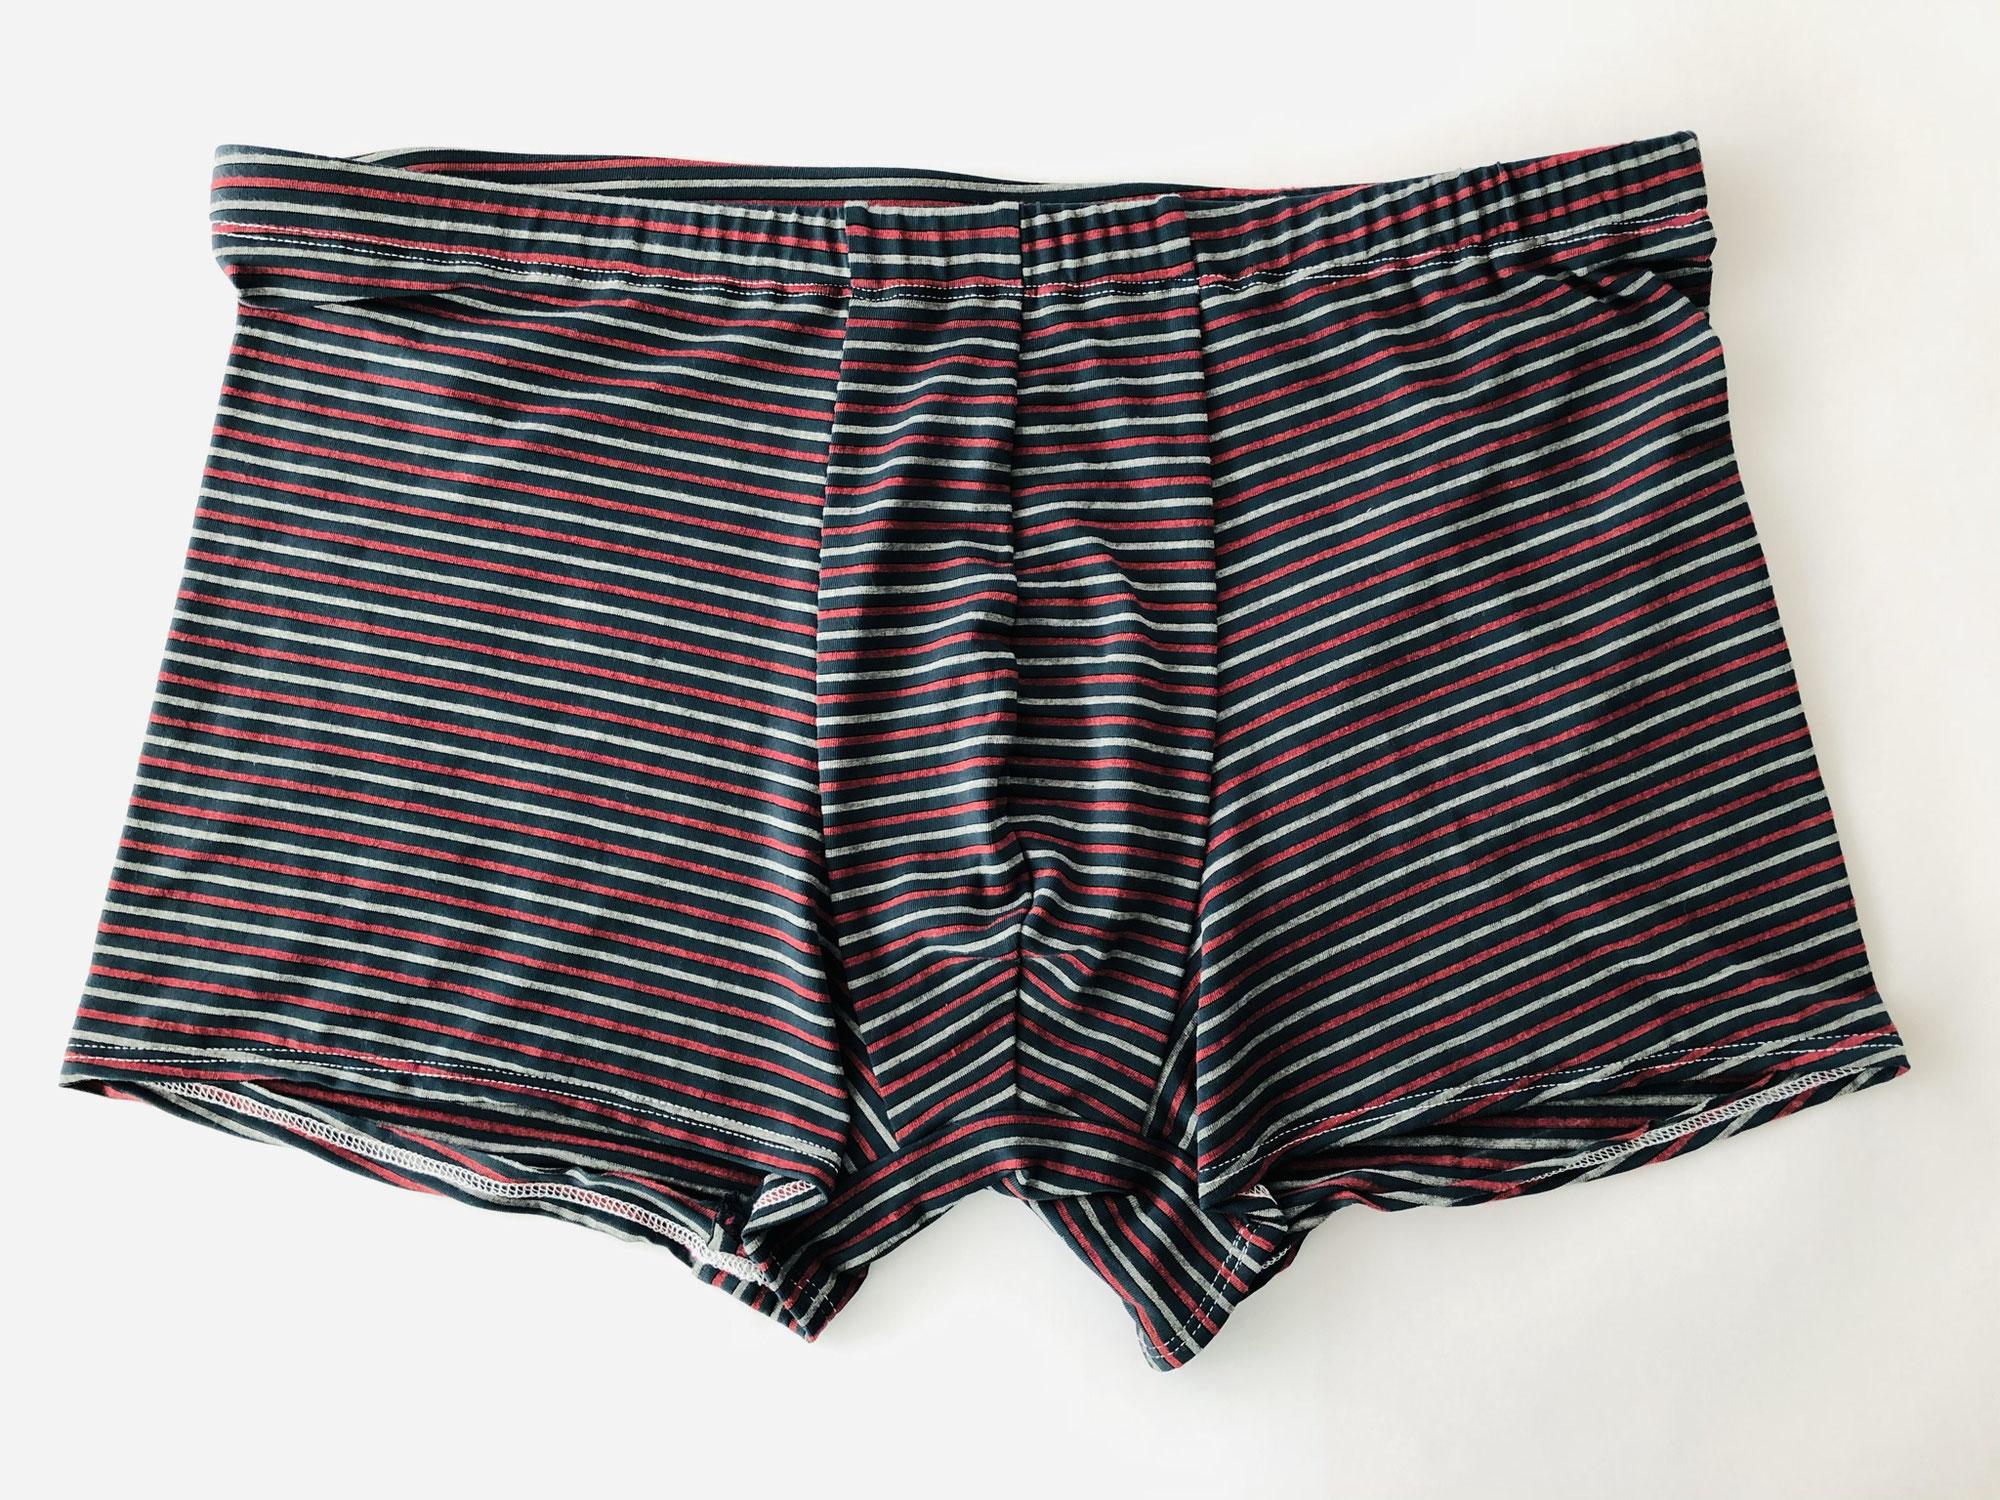 Herren-Unterhose